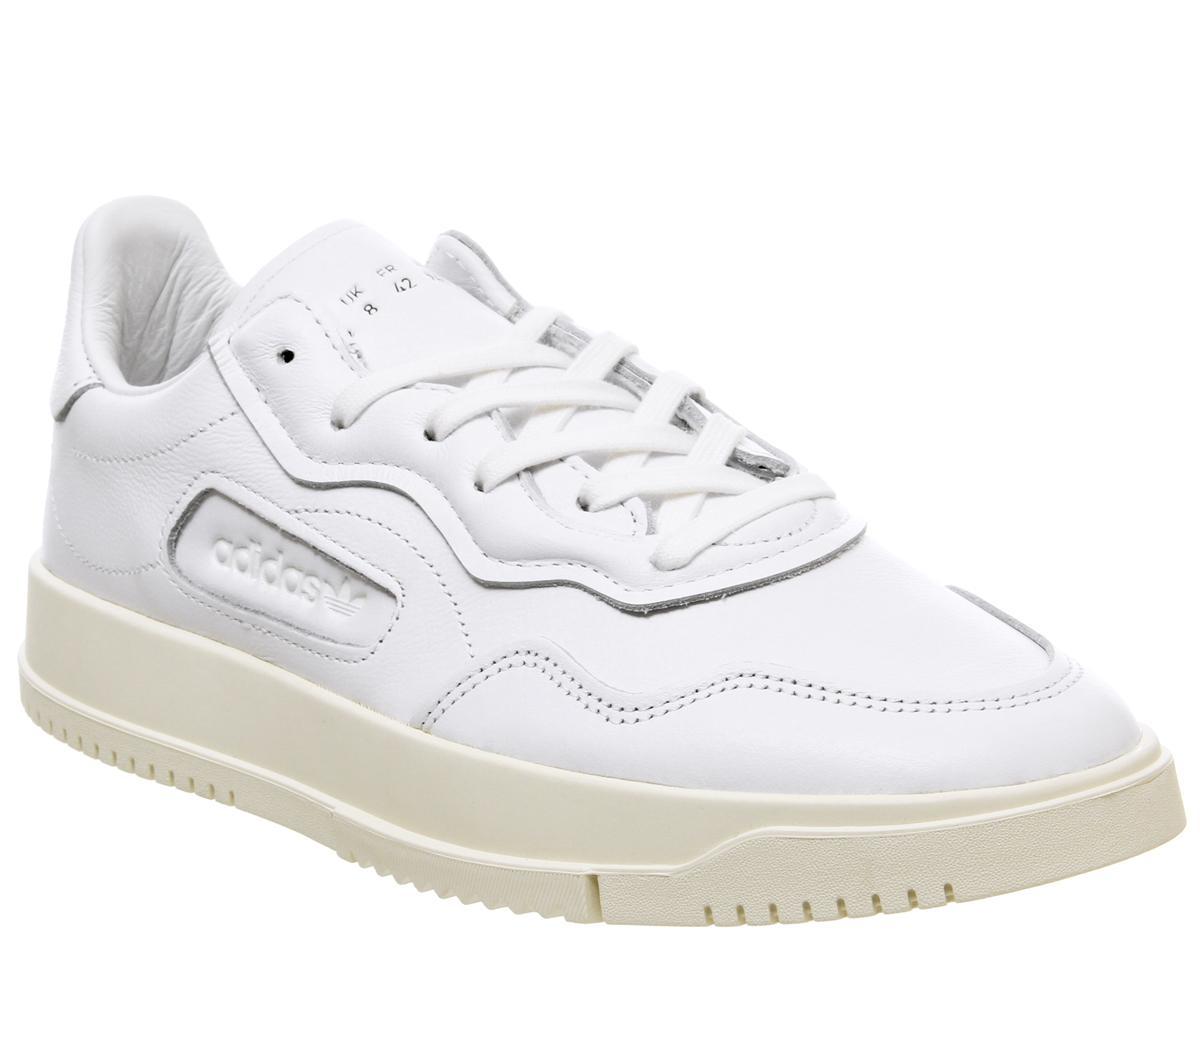 adidas Sc Premiere Trainers White White